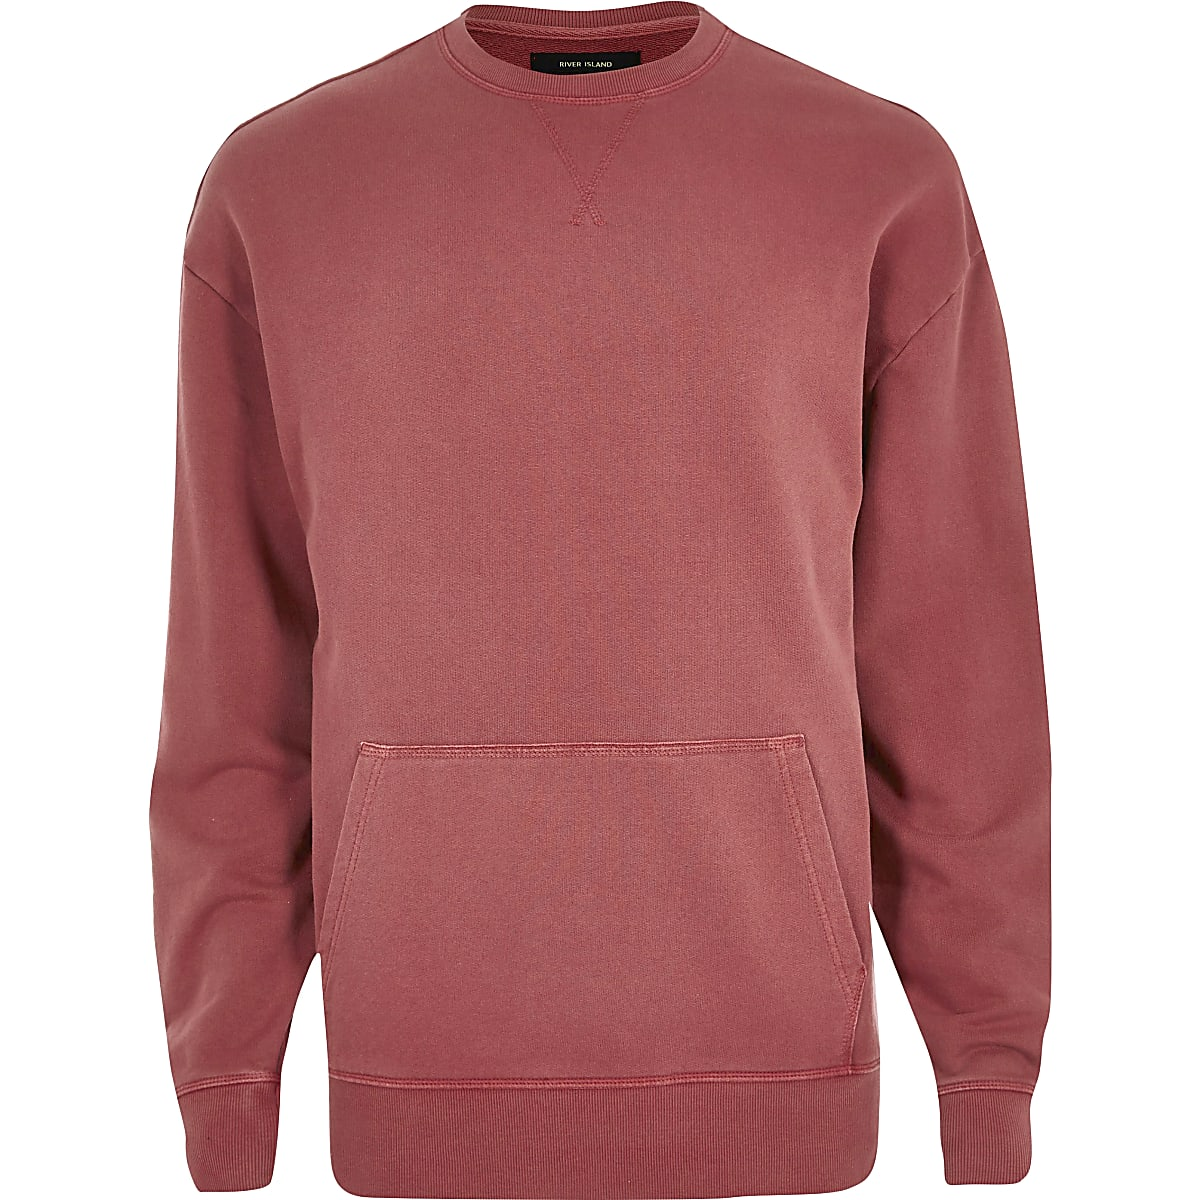 Red pocket sweatshirt